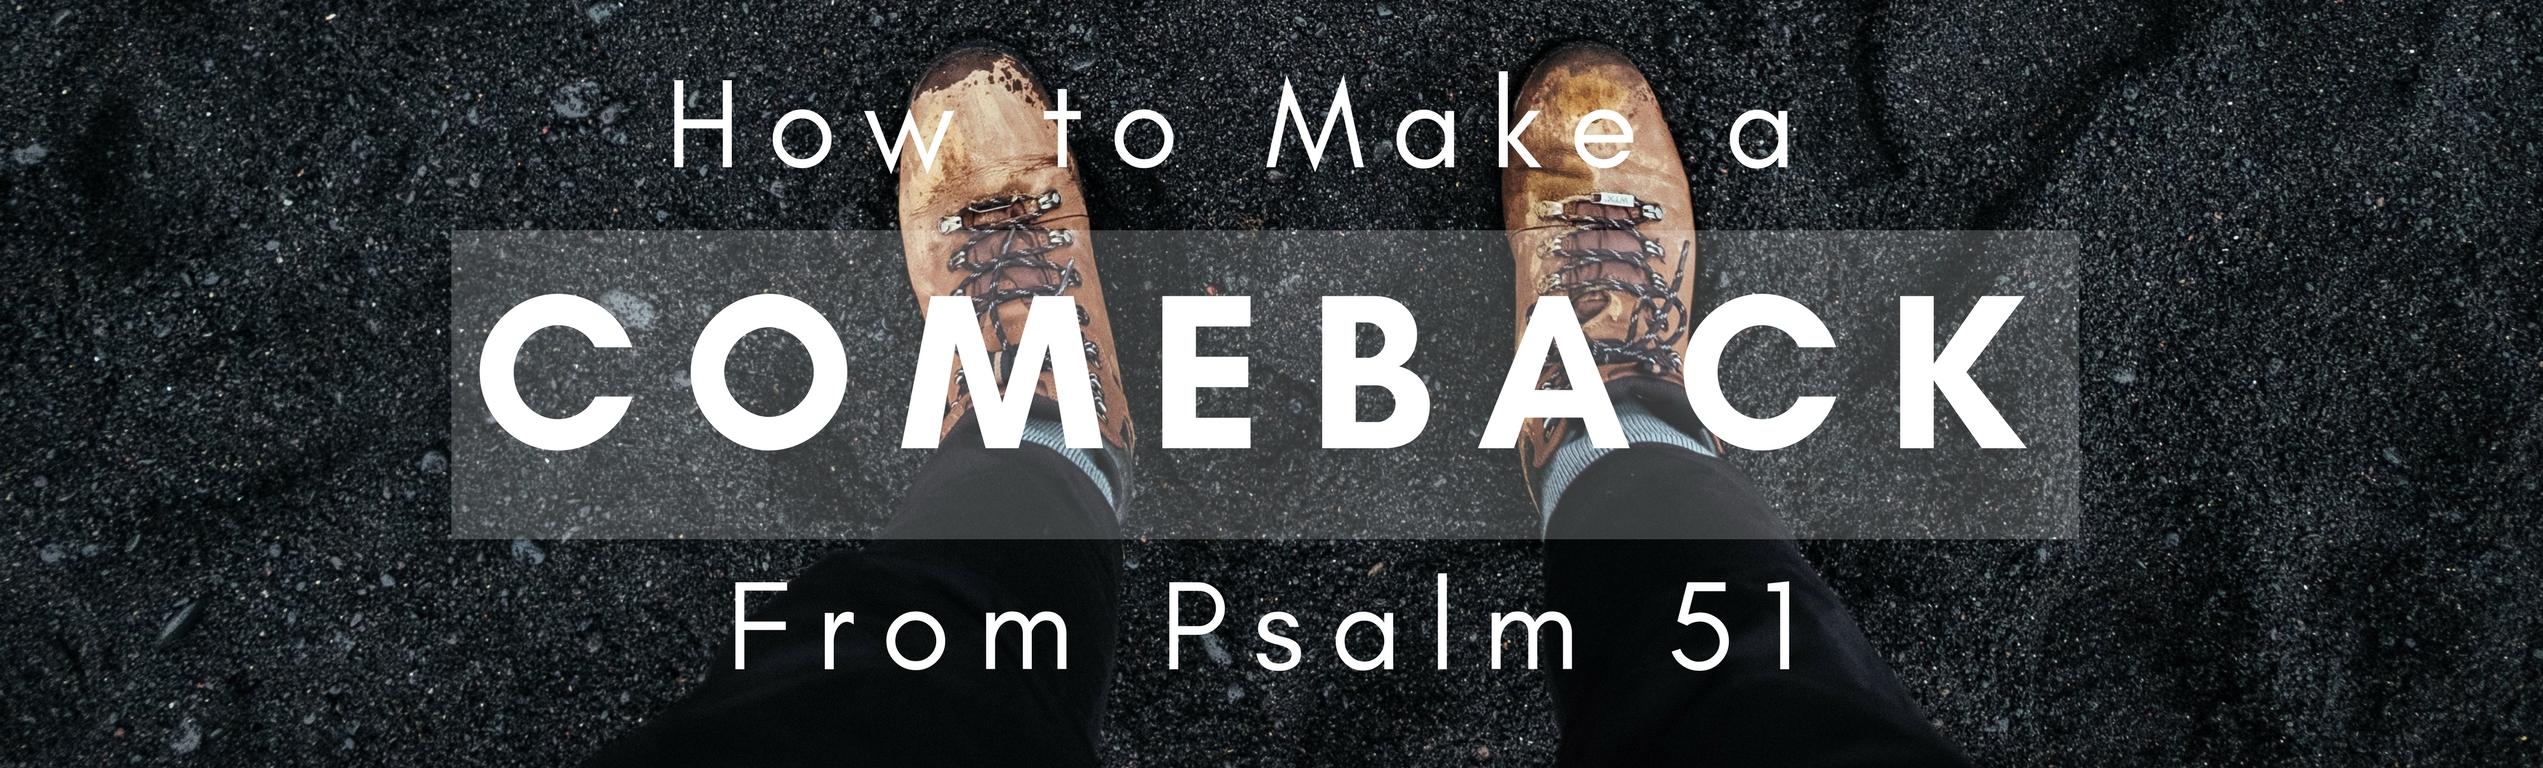 How to Make a Comeback | Psalm 51 | Bobby McGraw [sermon replay]